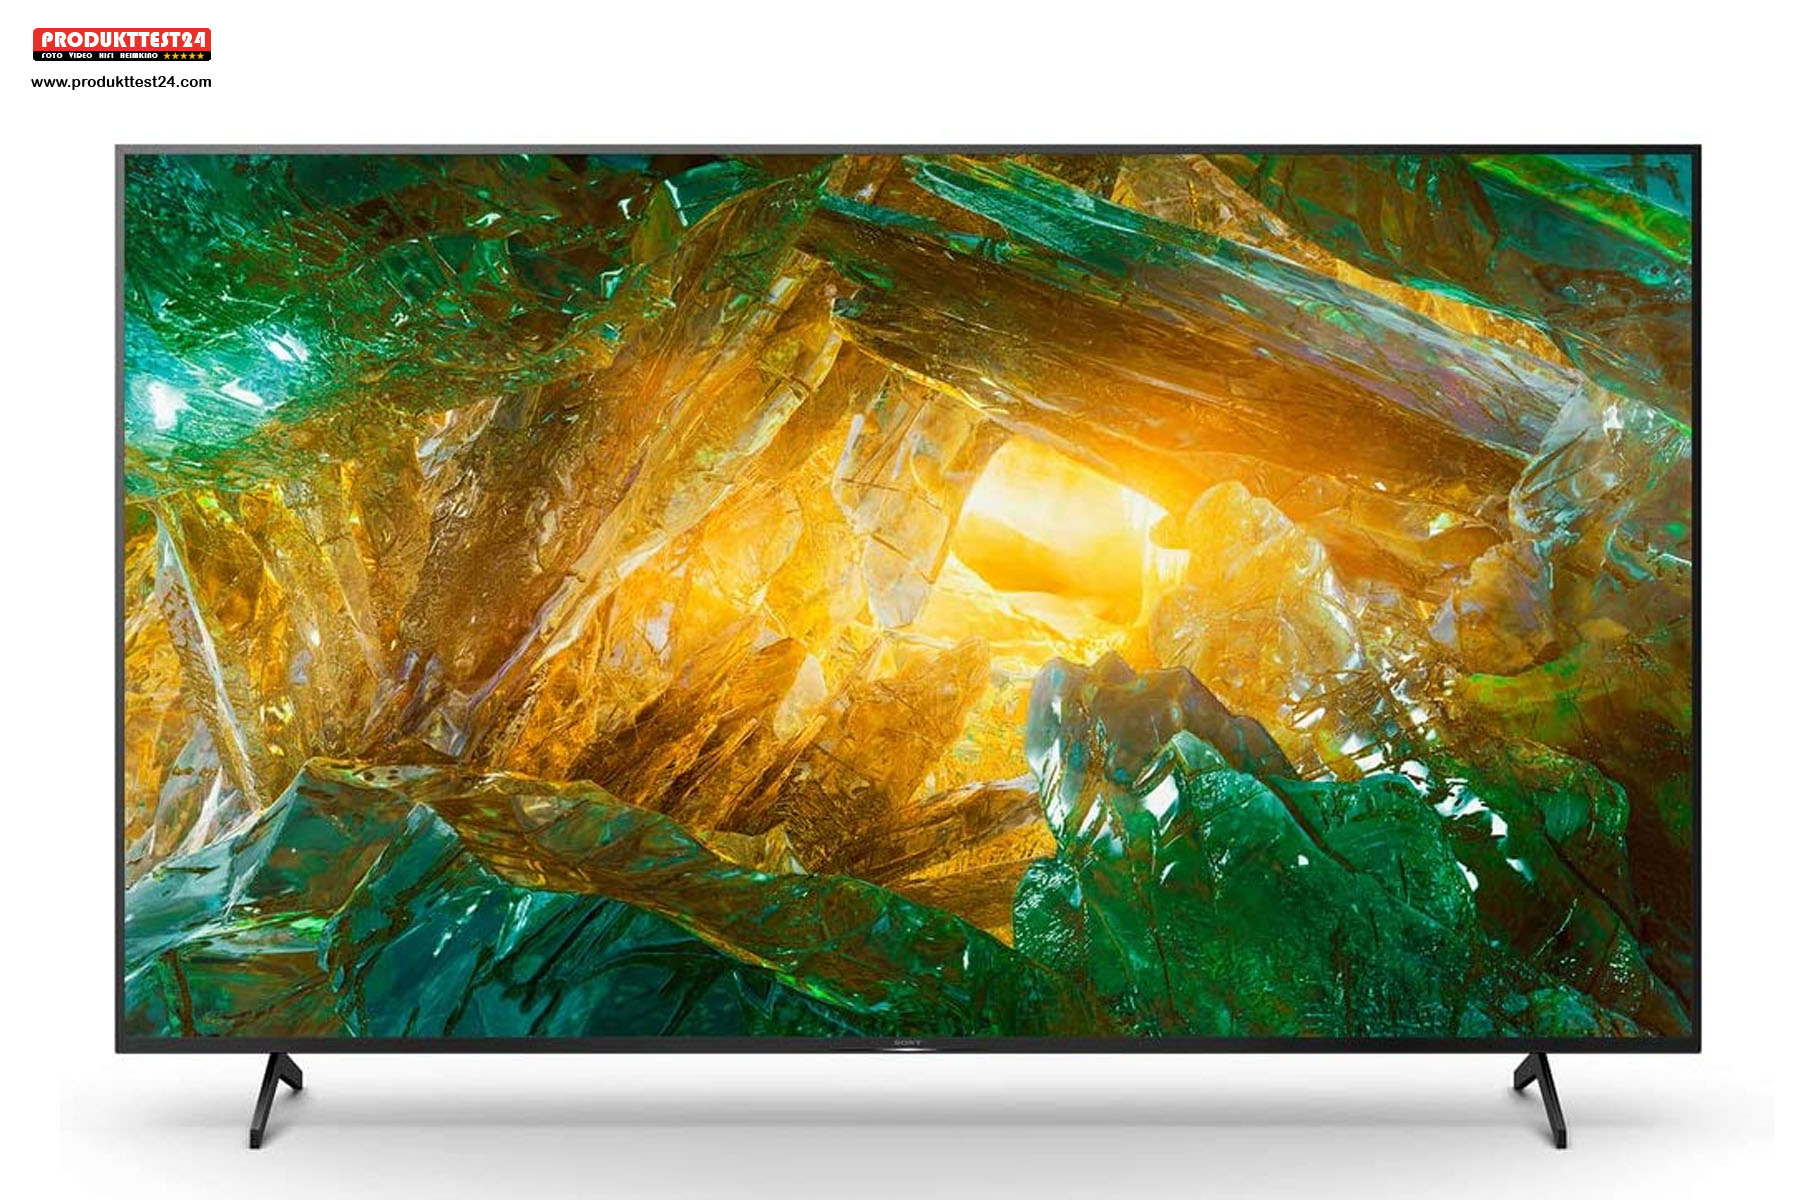 Sony Bravia KD-85XH8096 Ultra HD 4K-Fernseher im Test